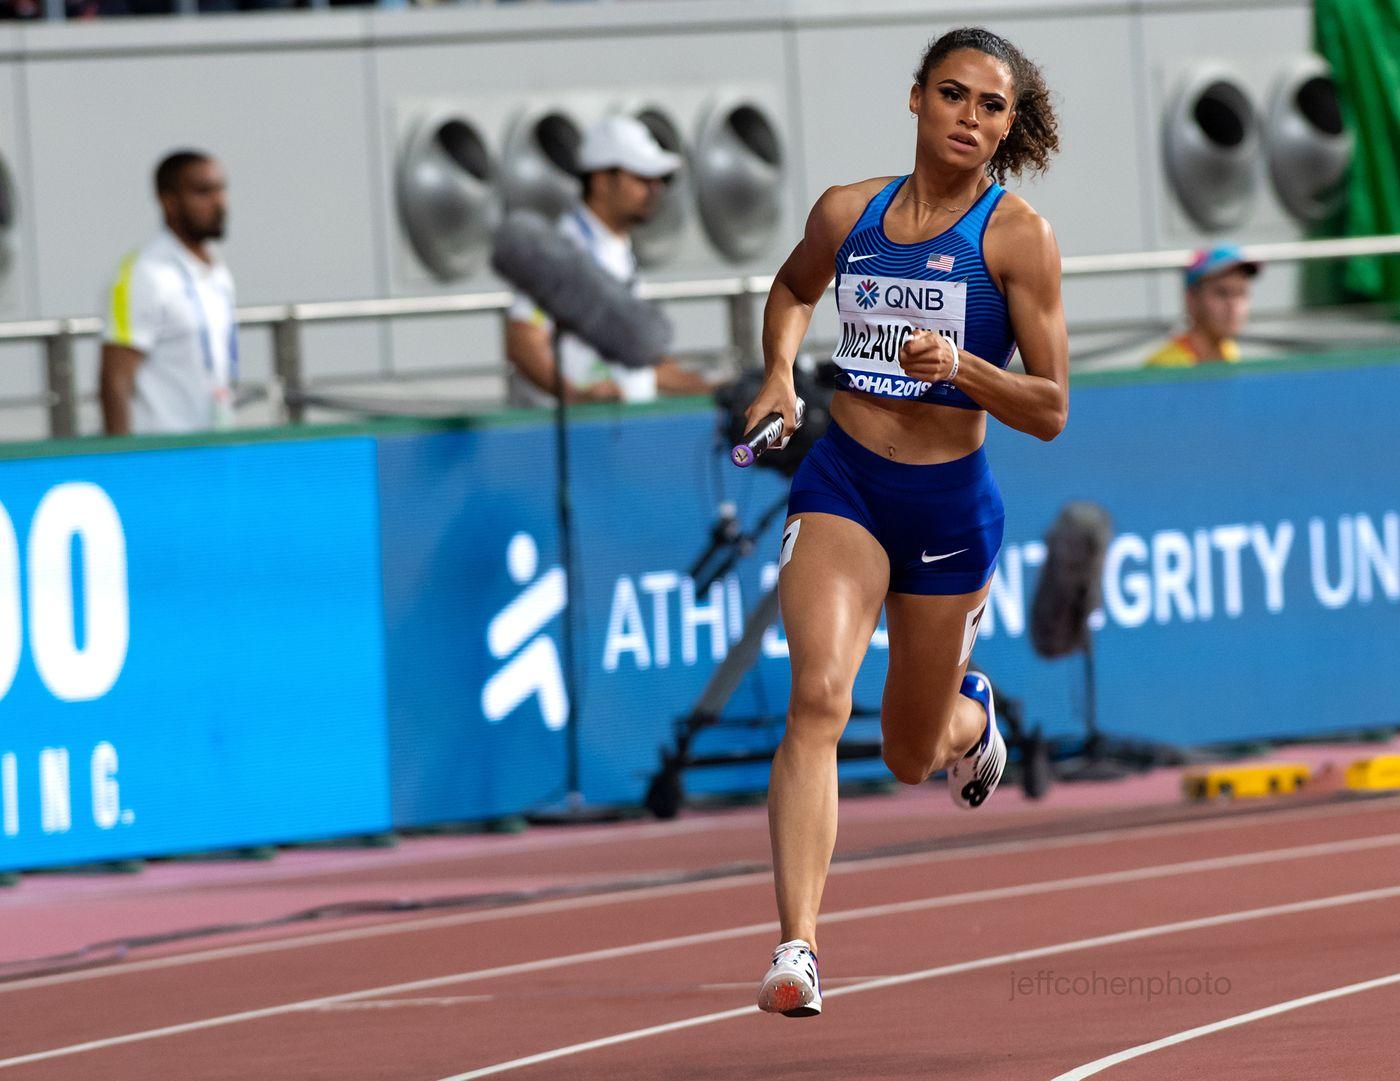 Sydney Mclaughlin, 4x400 meter relay, Team USA , gold medal. 2019 IAAF World Athletics Championships Doha, Qatar.